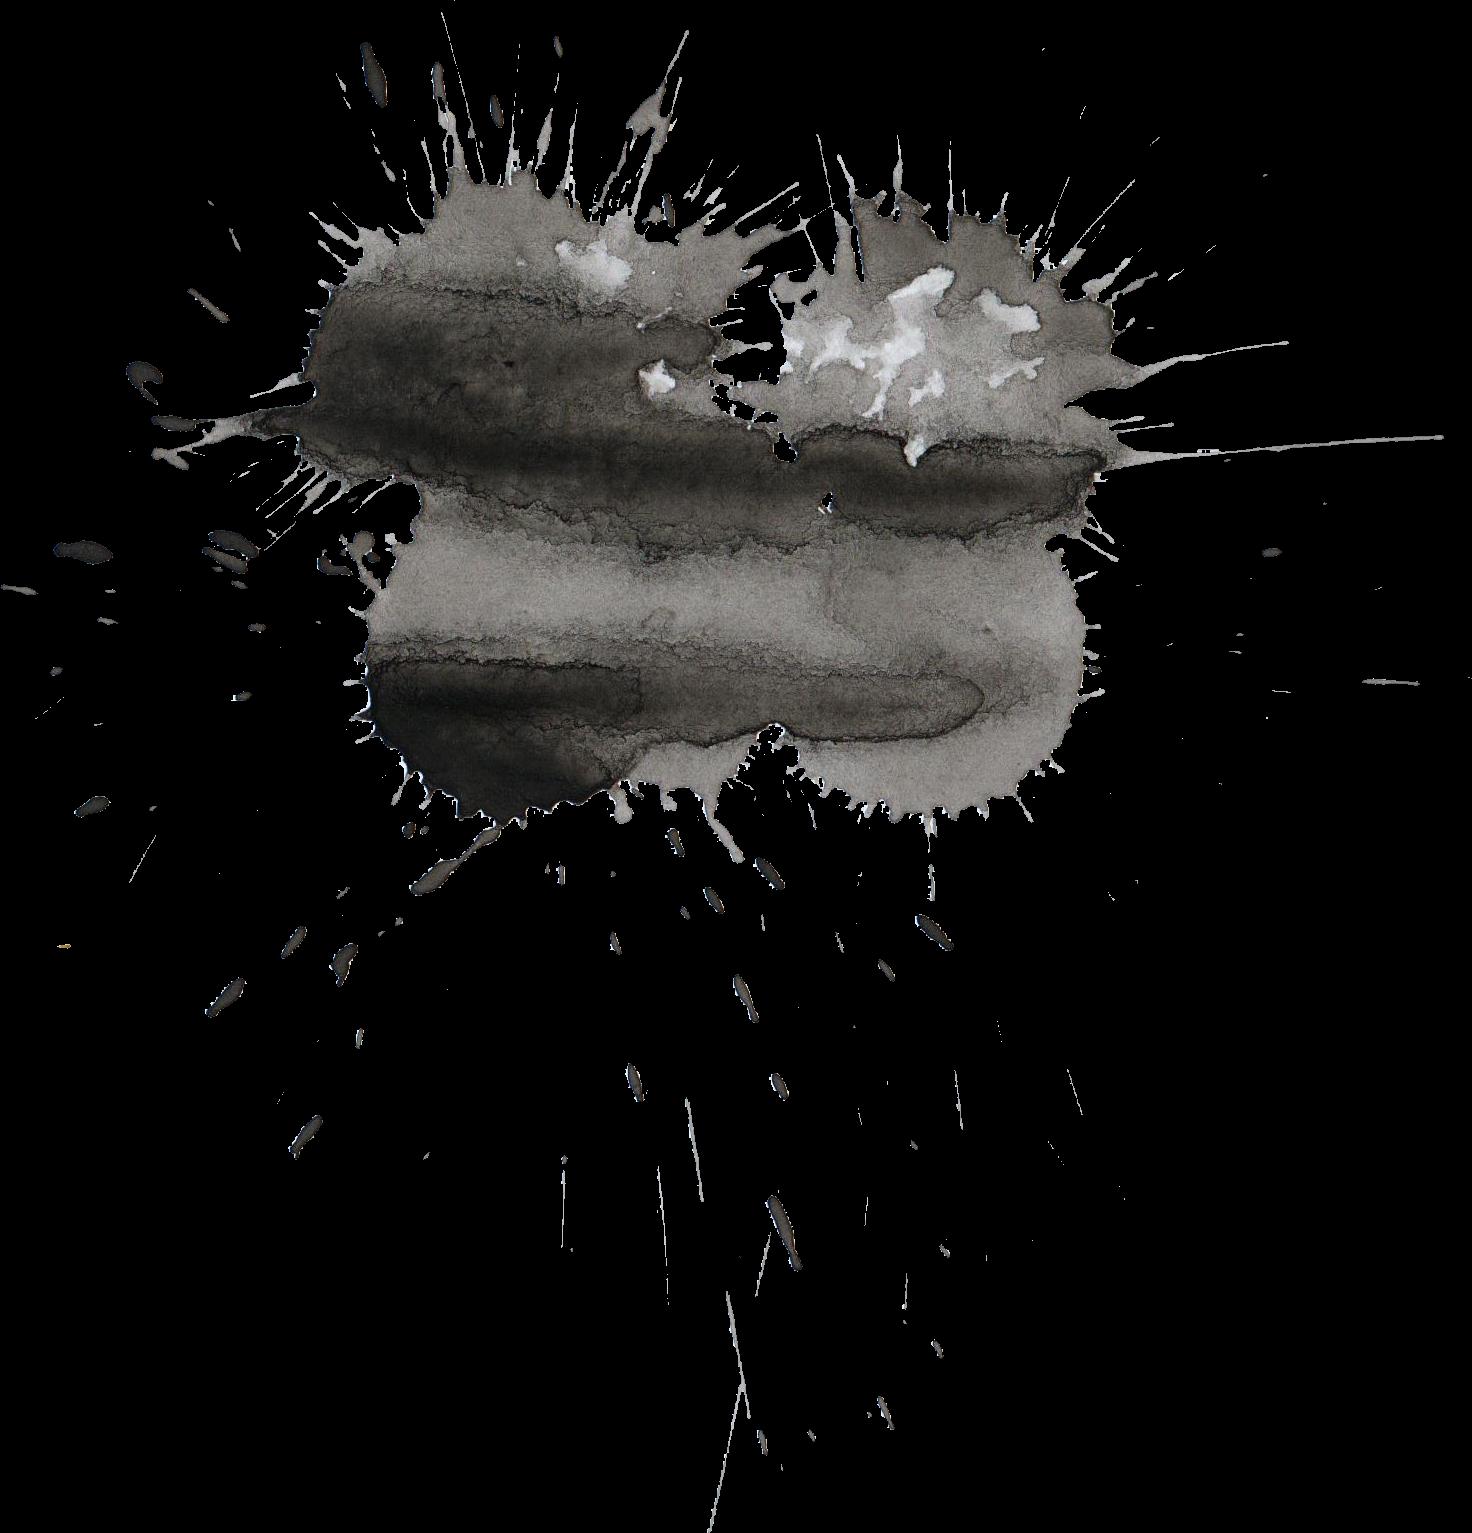 black splash png chocolate splash png - free download - black watercolor